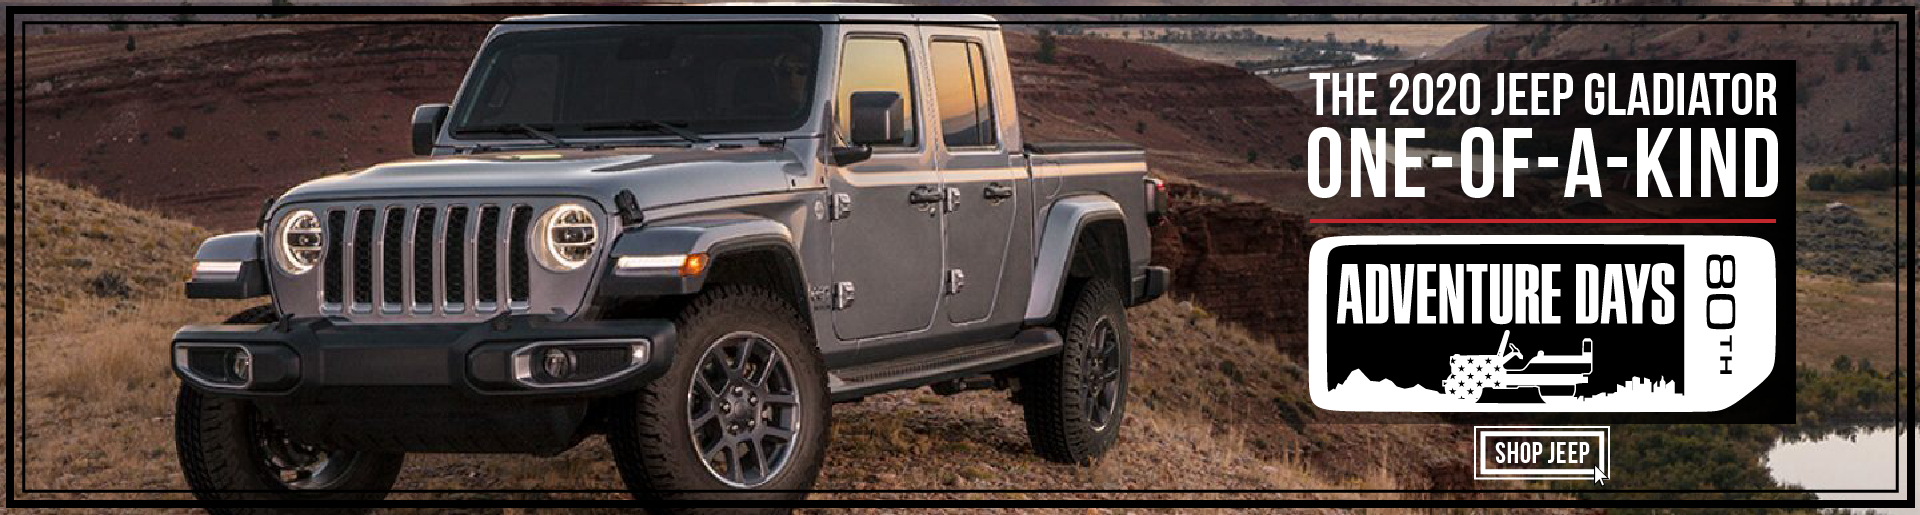 2020 Jeep Gladiator Generic- September 2020